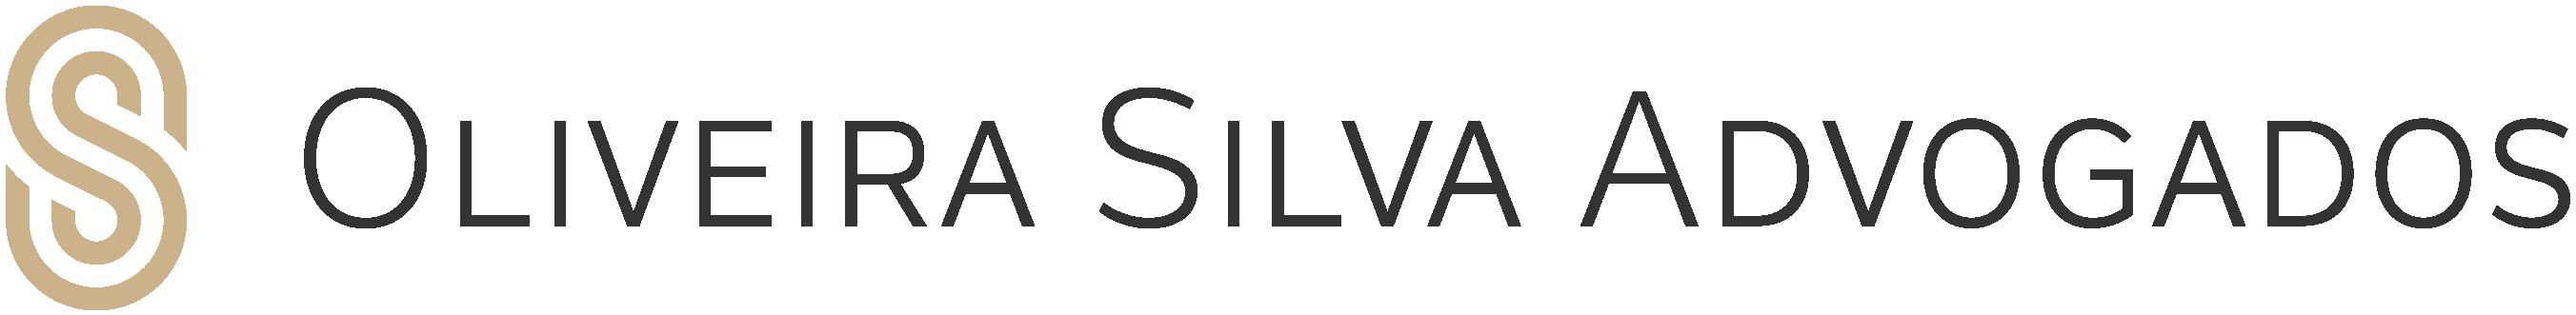 Oliveira Silva Advogados